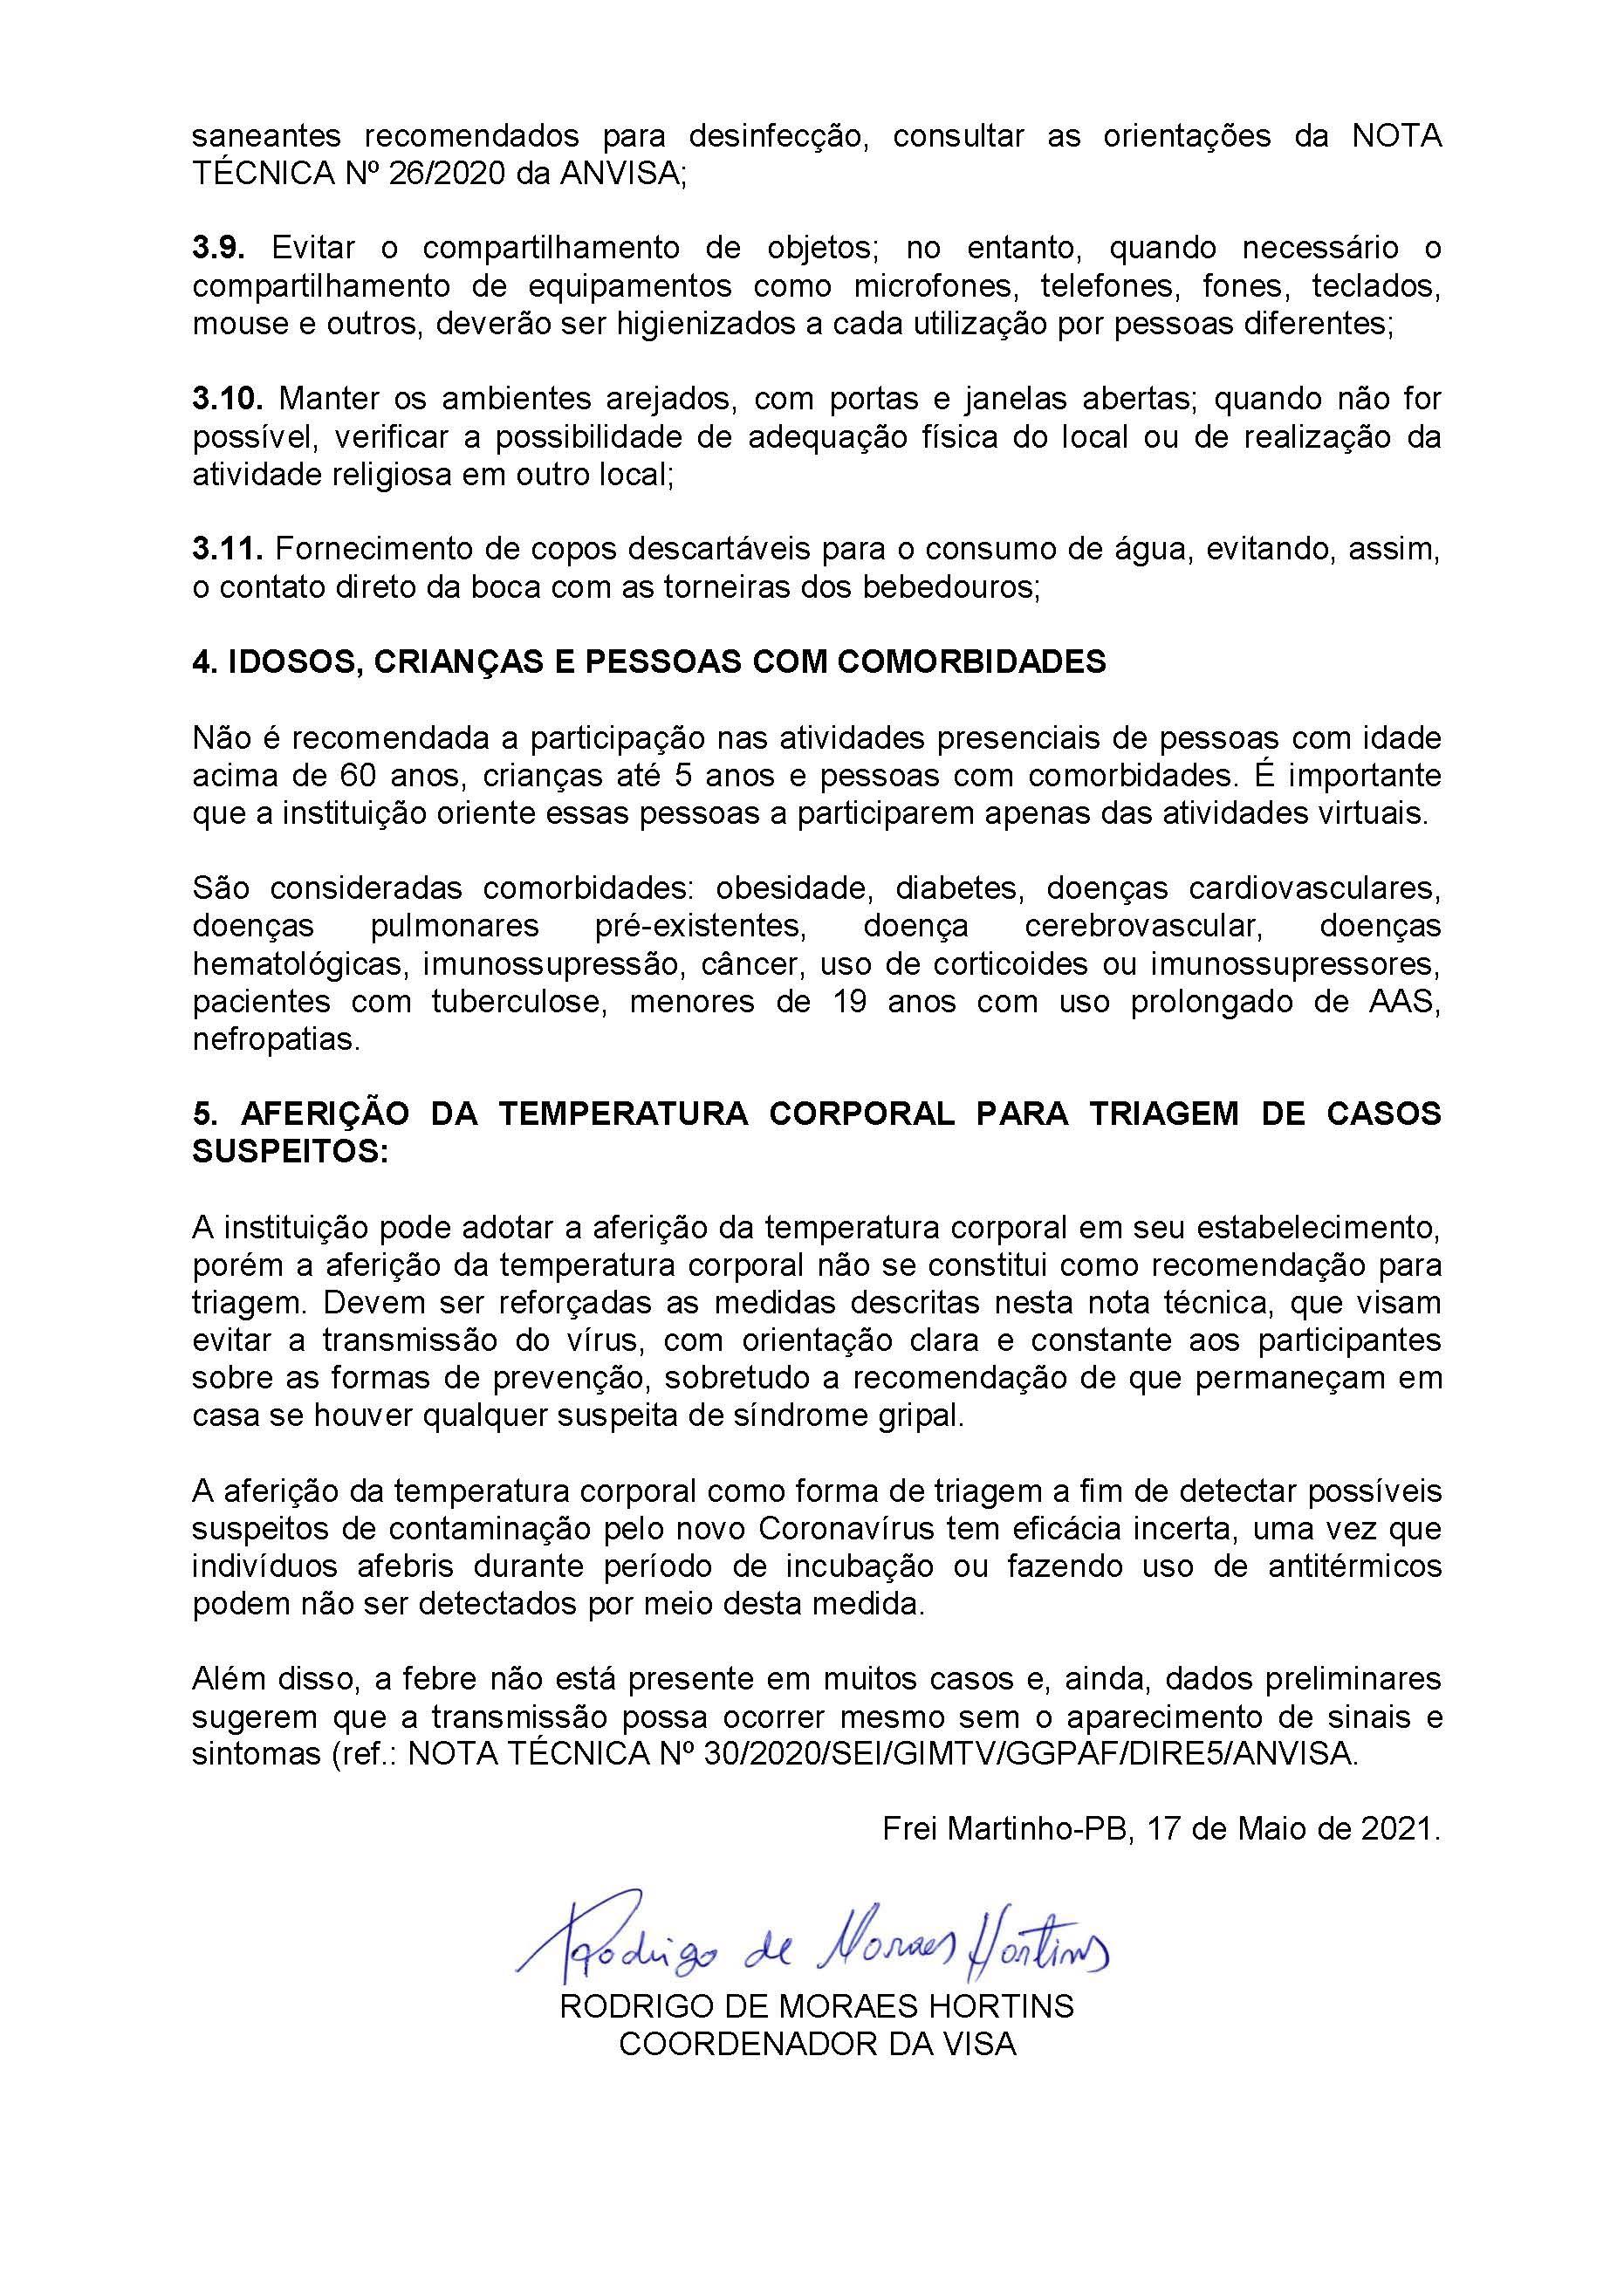 nota-tecnica-visa-001-2021-pagina-3.jpg